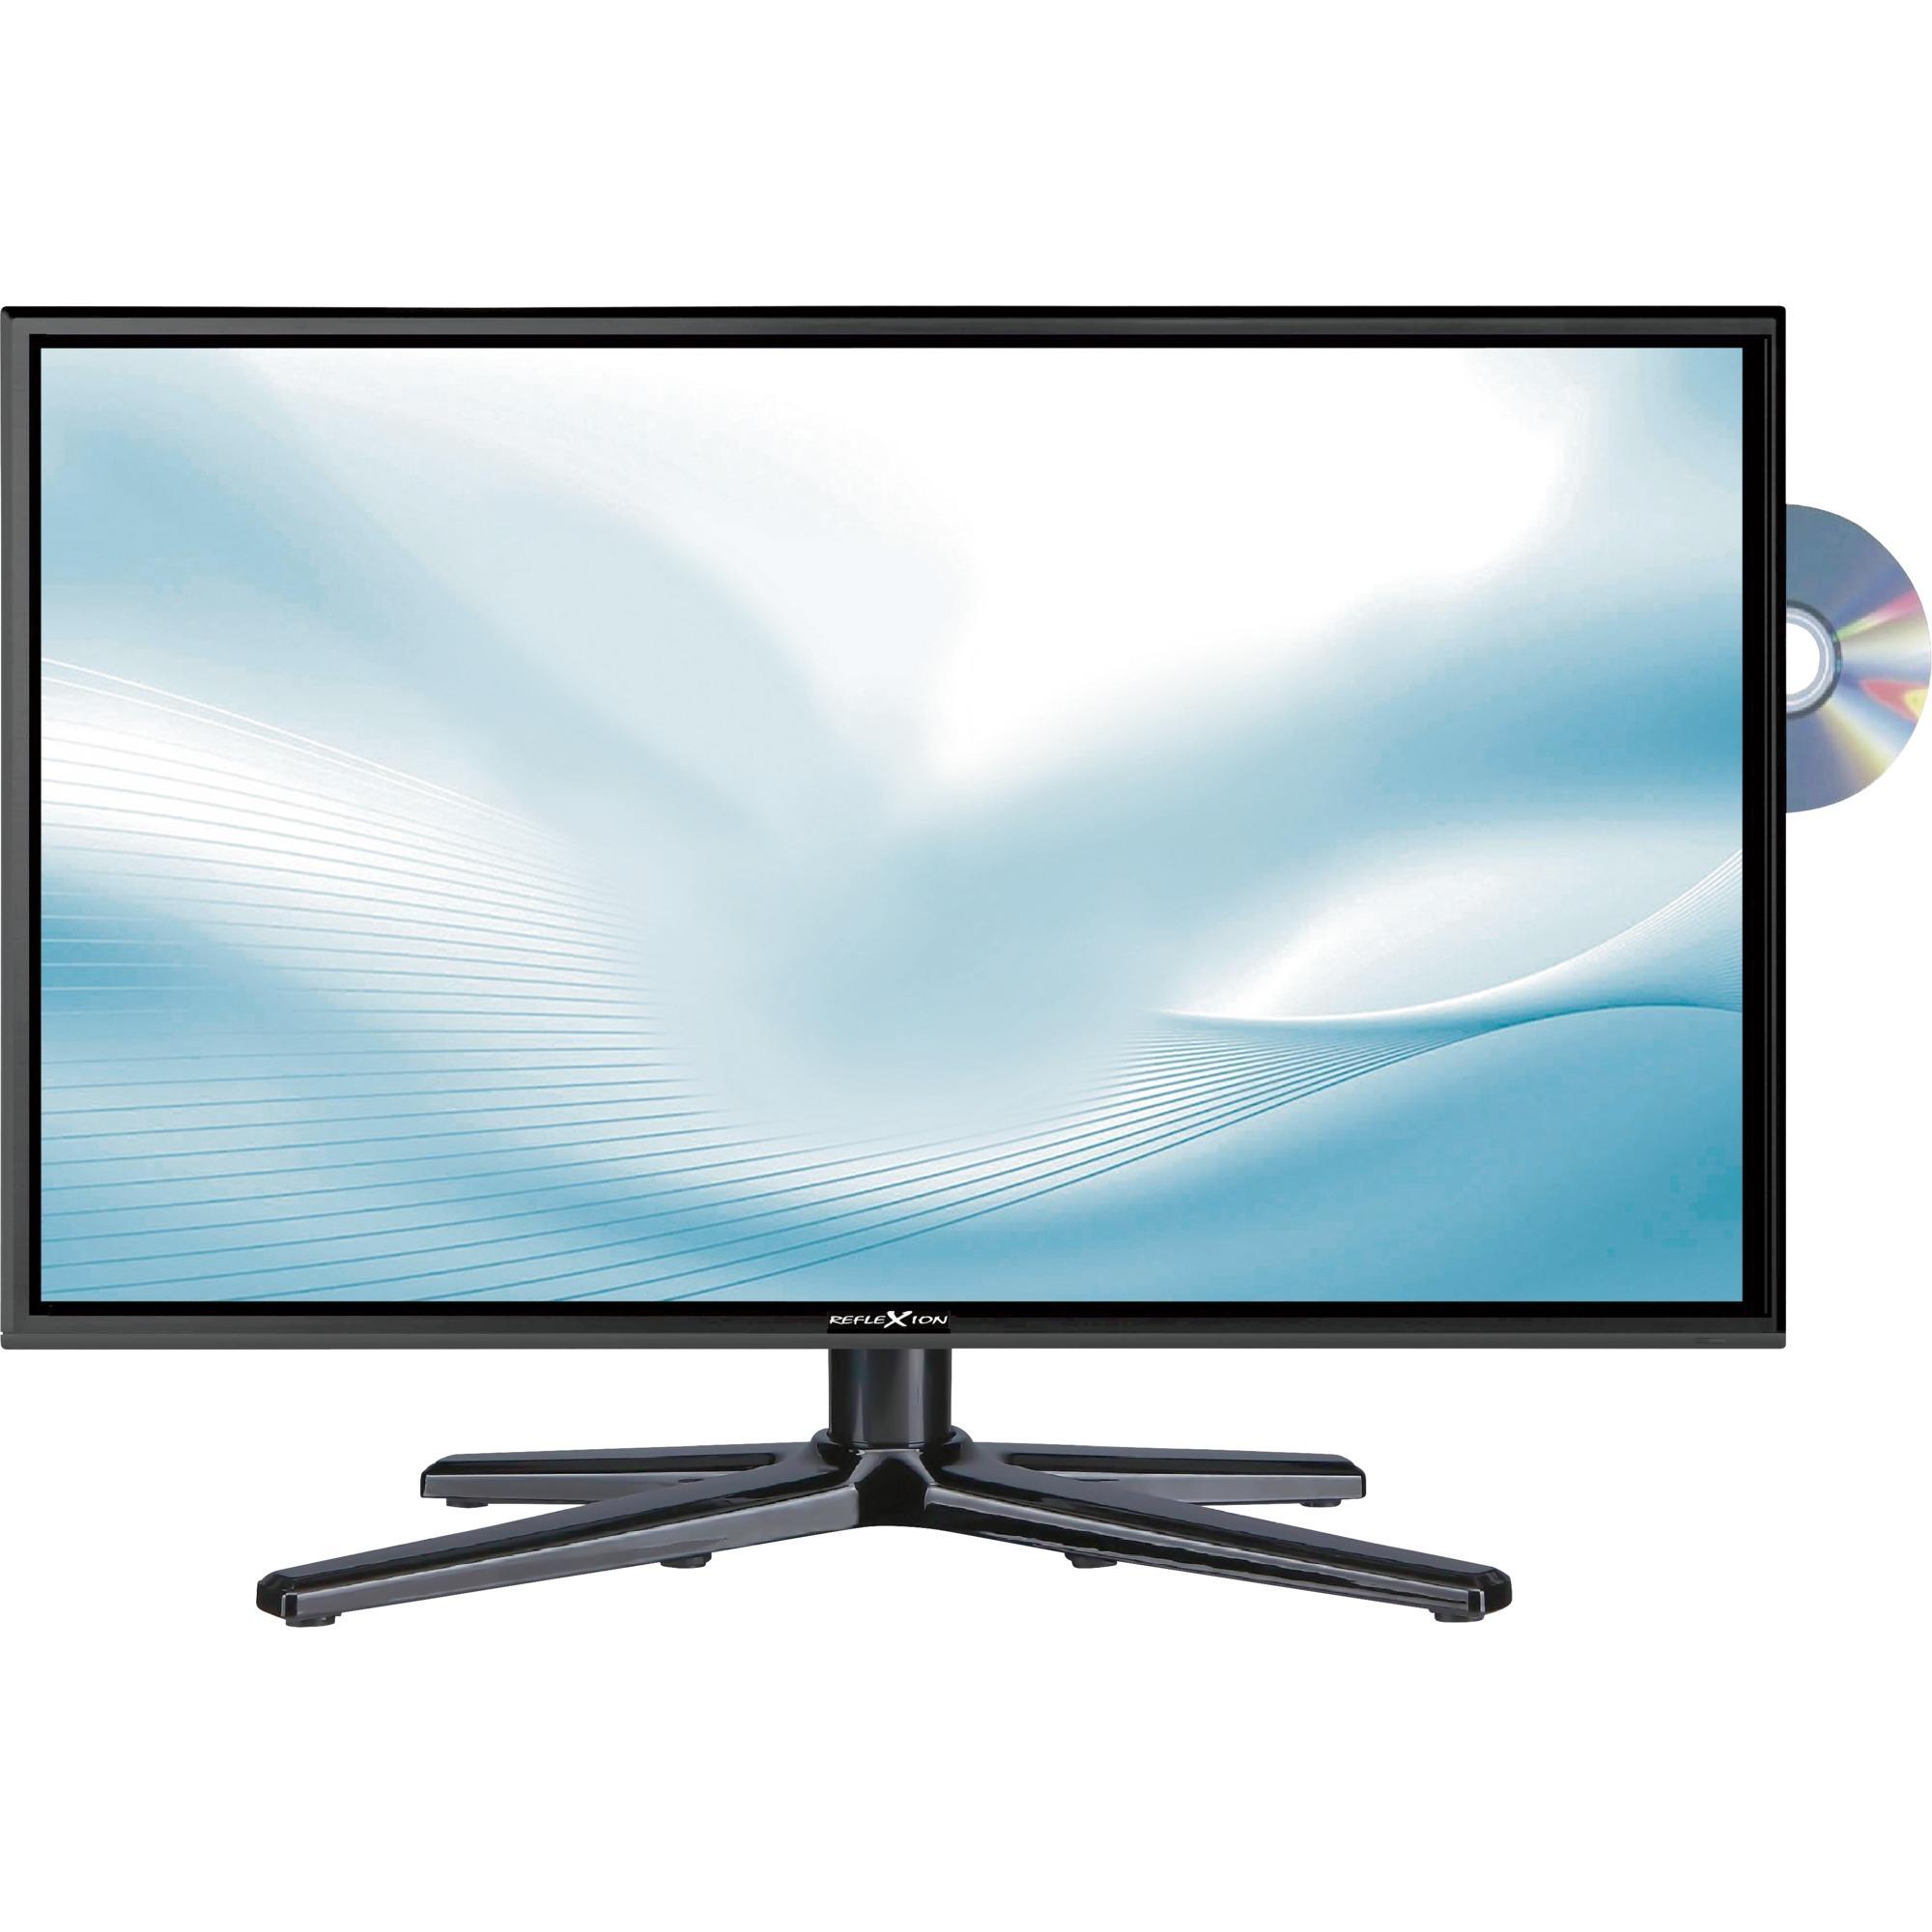 LDDW19 18.5 HD 200cd/m2 Noir A 3W hospitality TV, Téléviseur LED